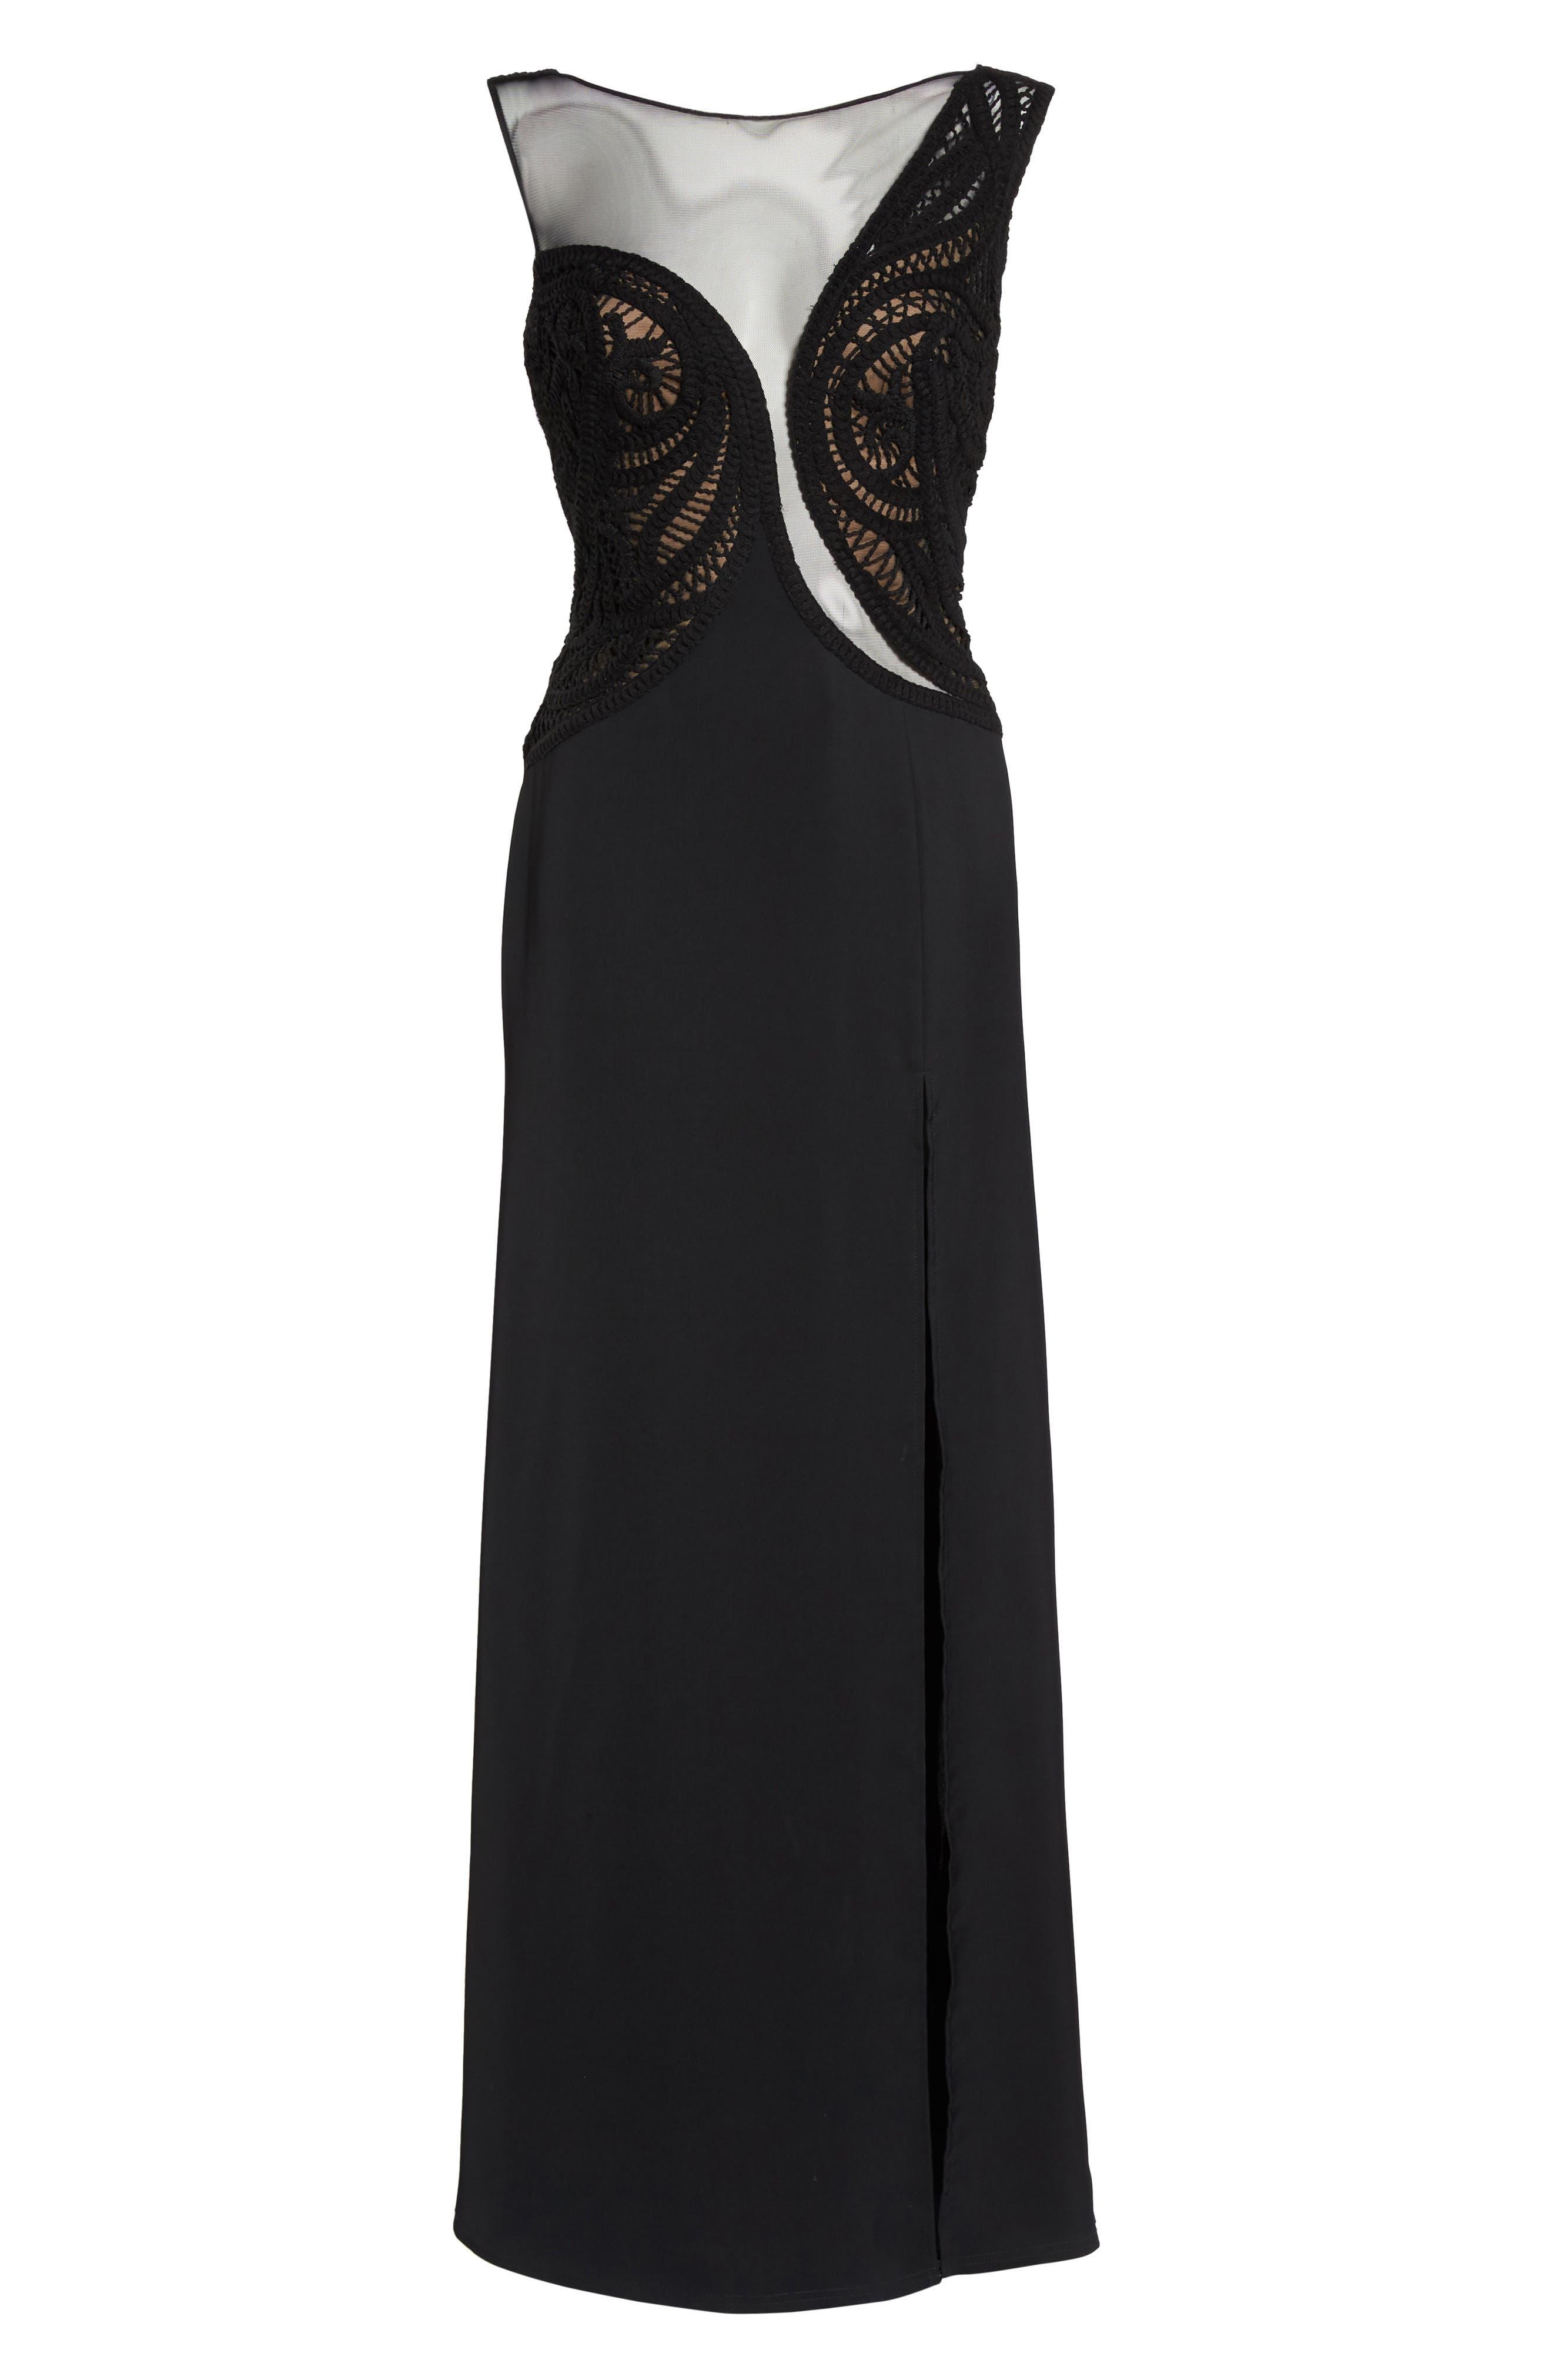 Crochet Lace Gown,                             Alternate thumbnail 6, color,                             Black/ Nude